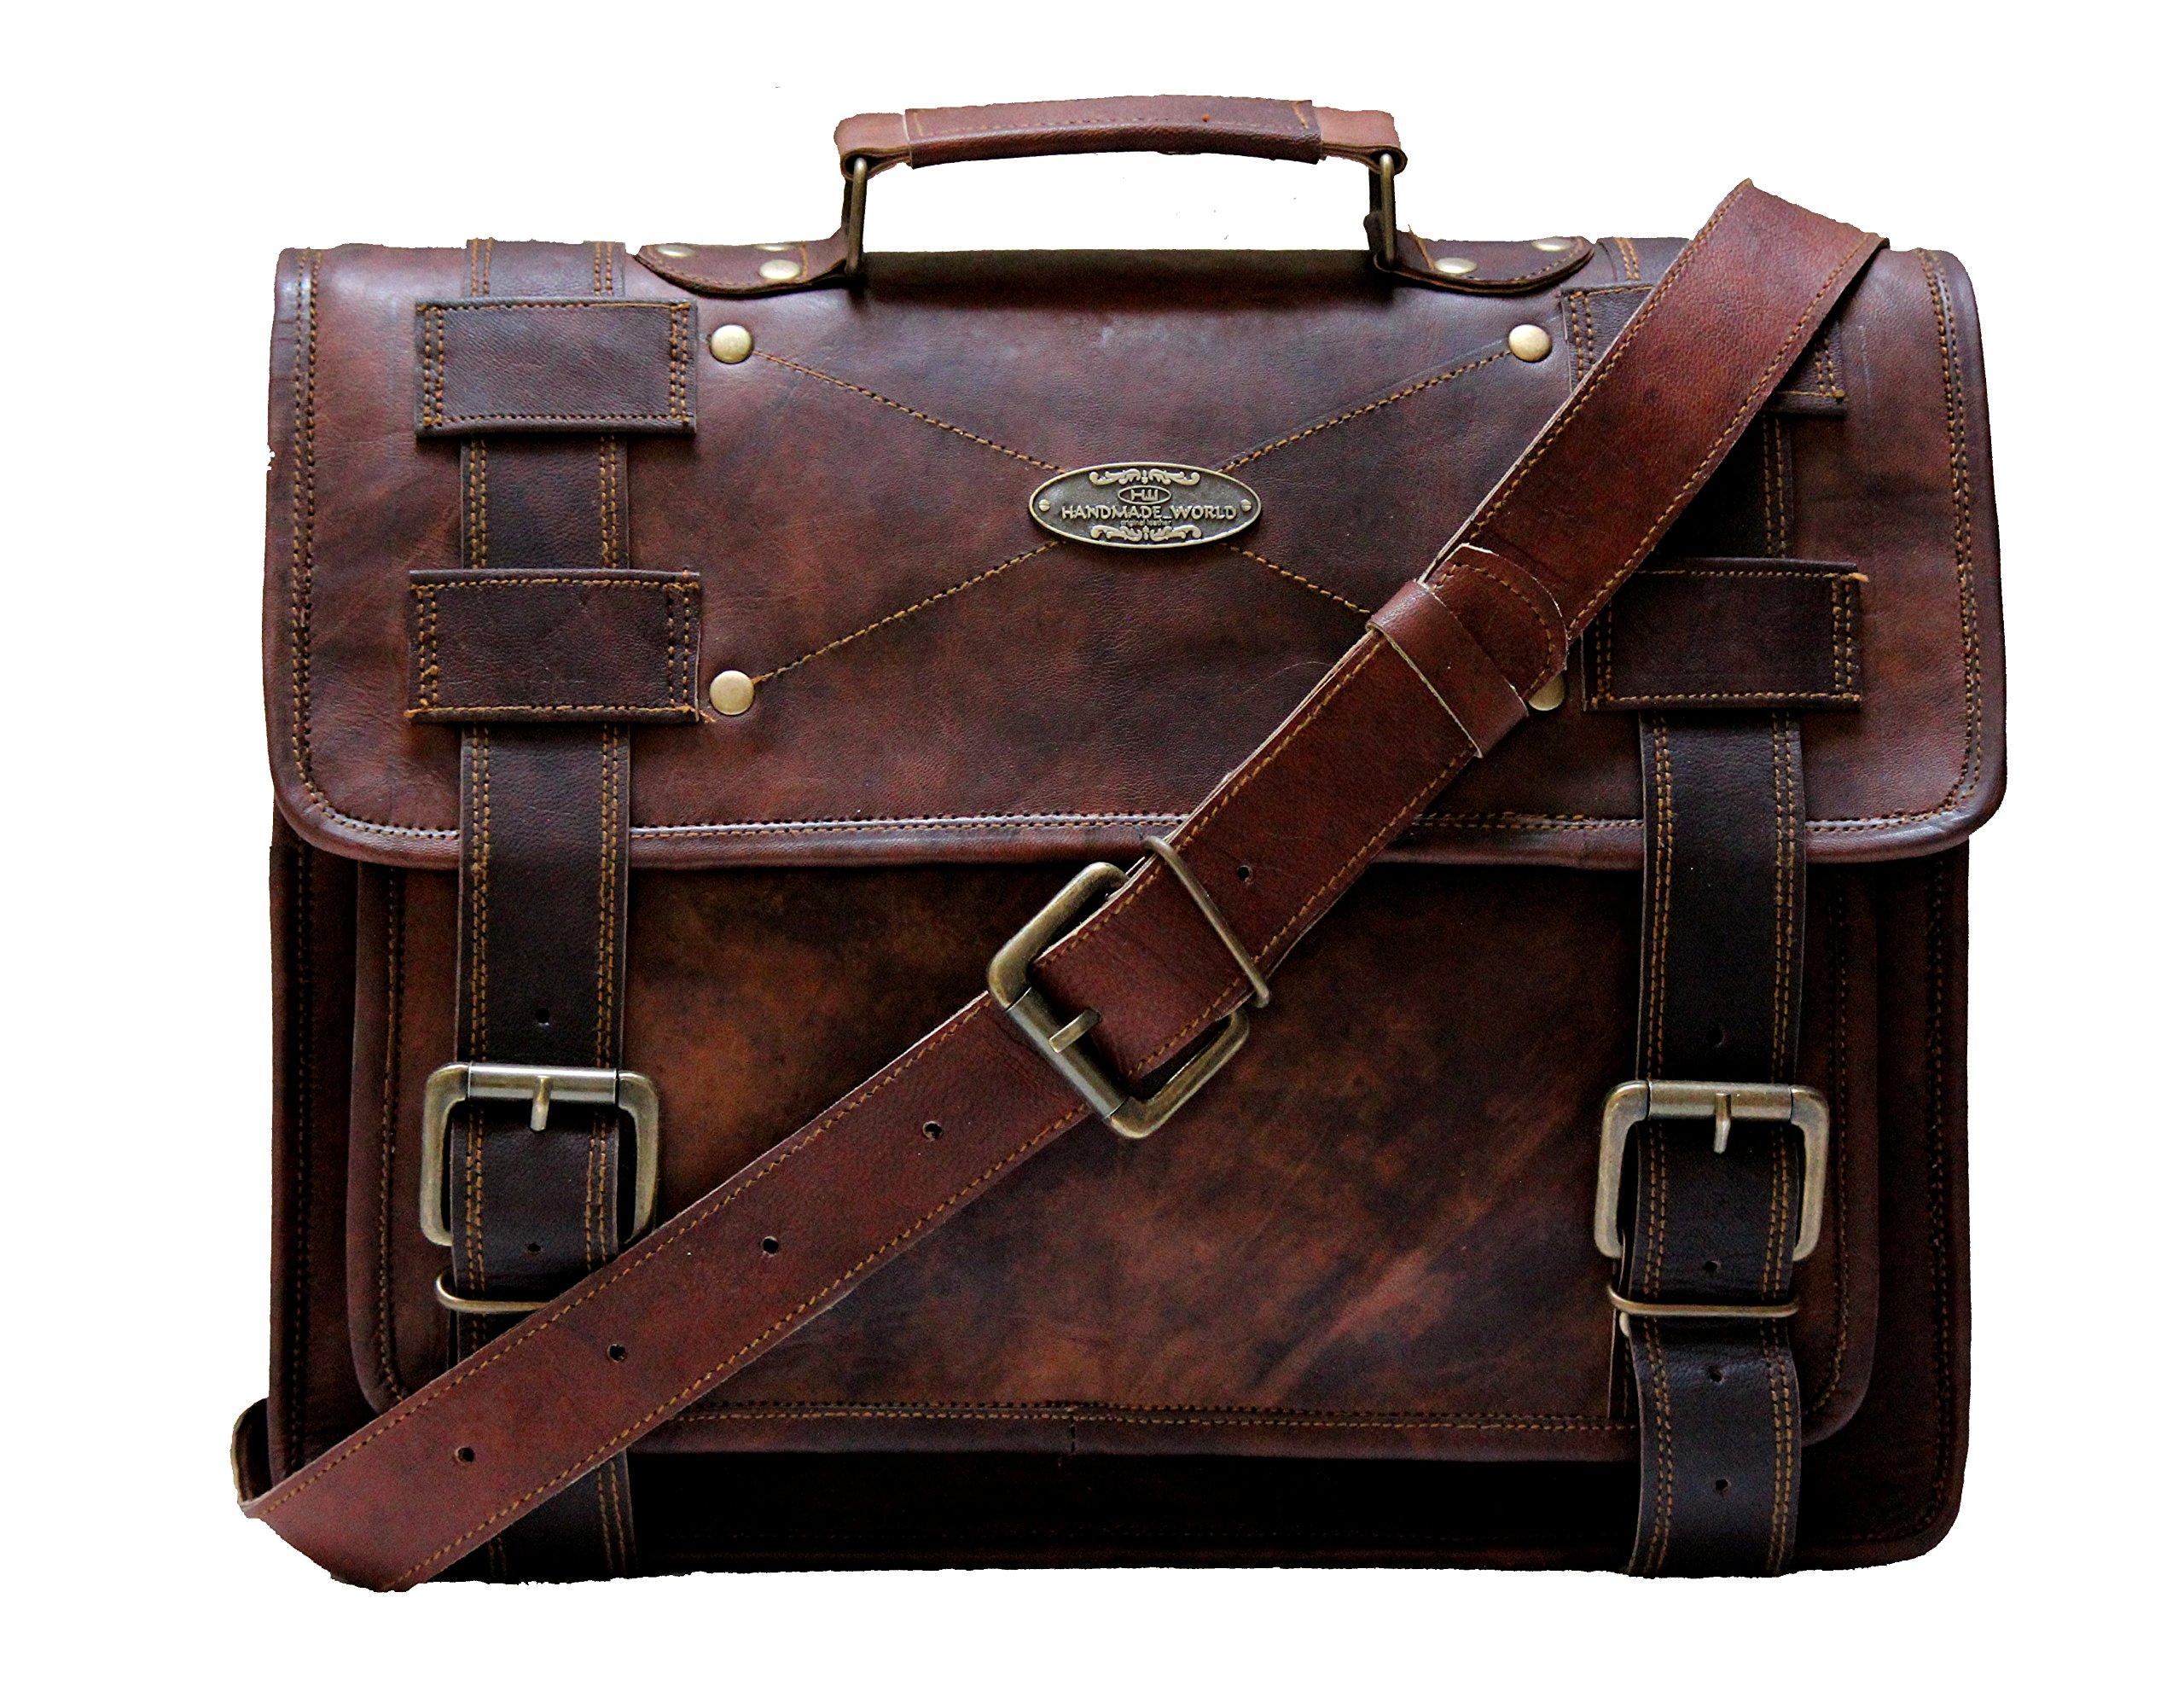 Handmade_World leather messenger bags 15'' for men women mens laptop computer bag best shoulder satchel school distressed briefcase unisex Cross body